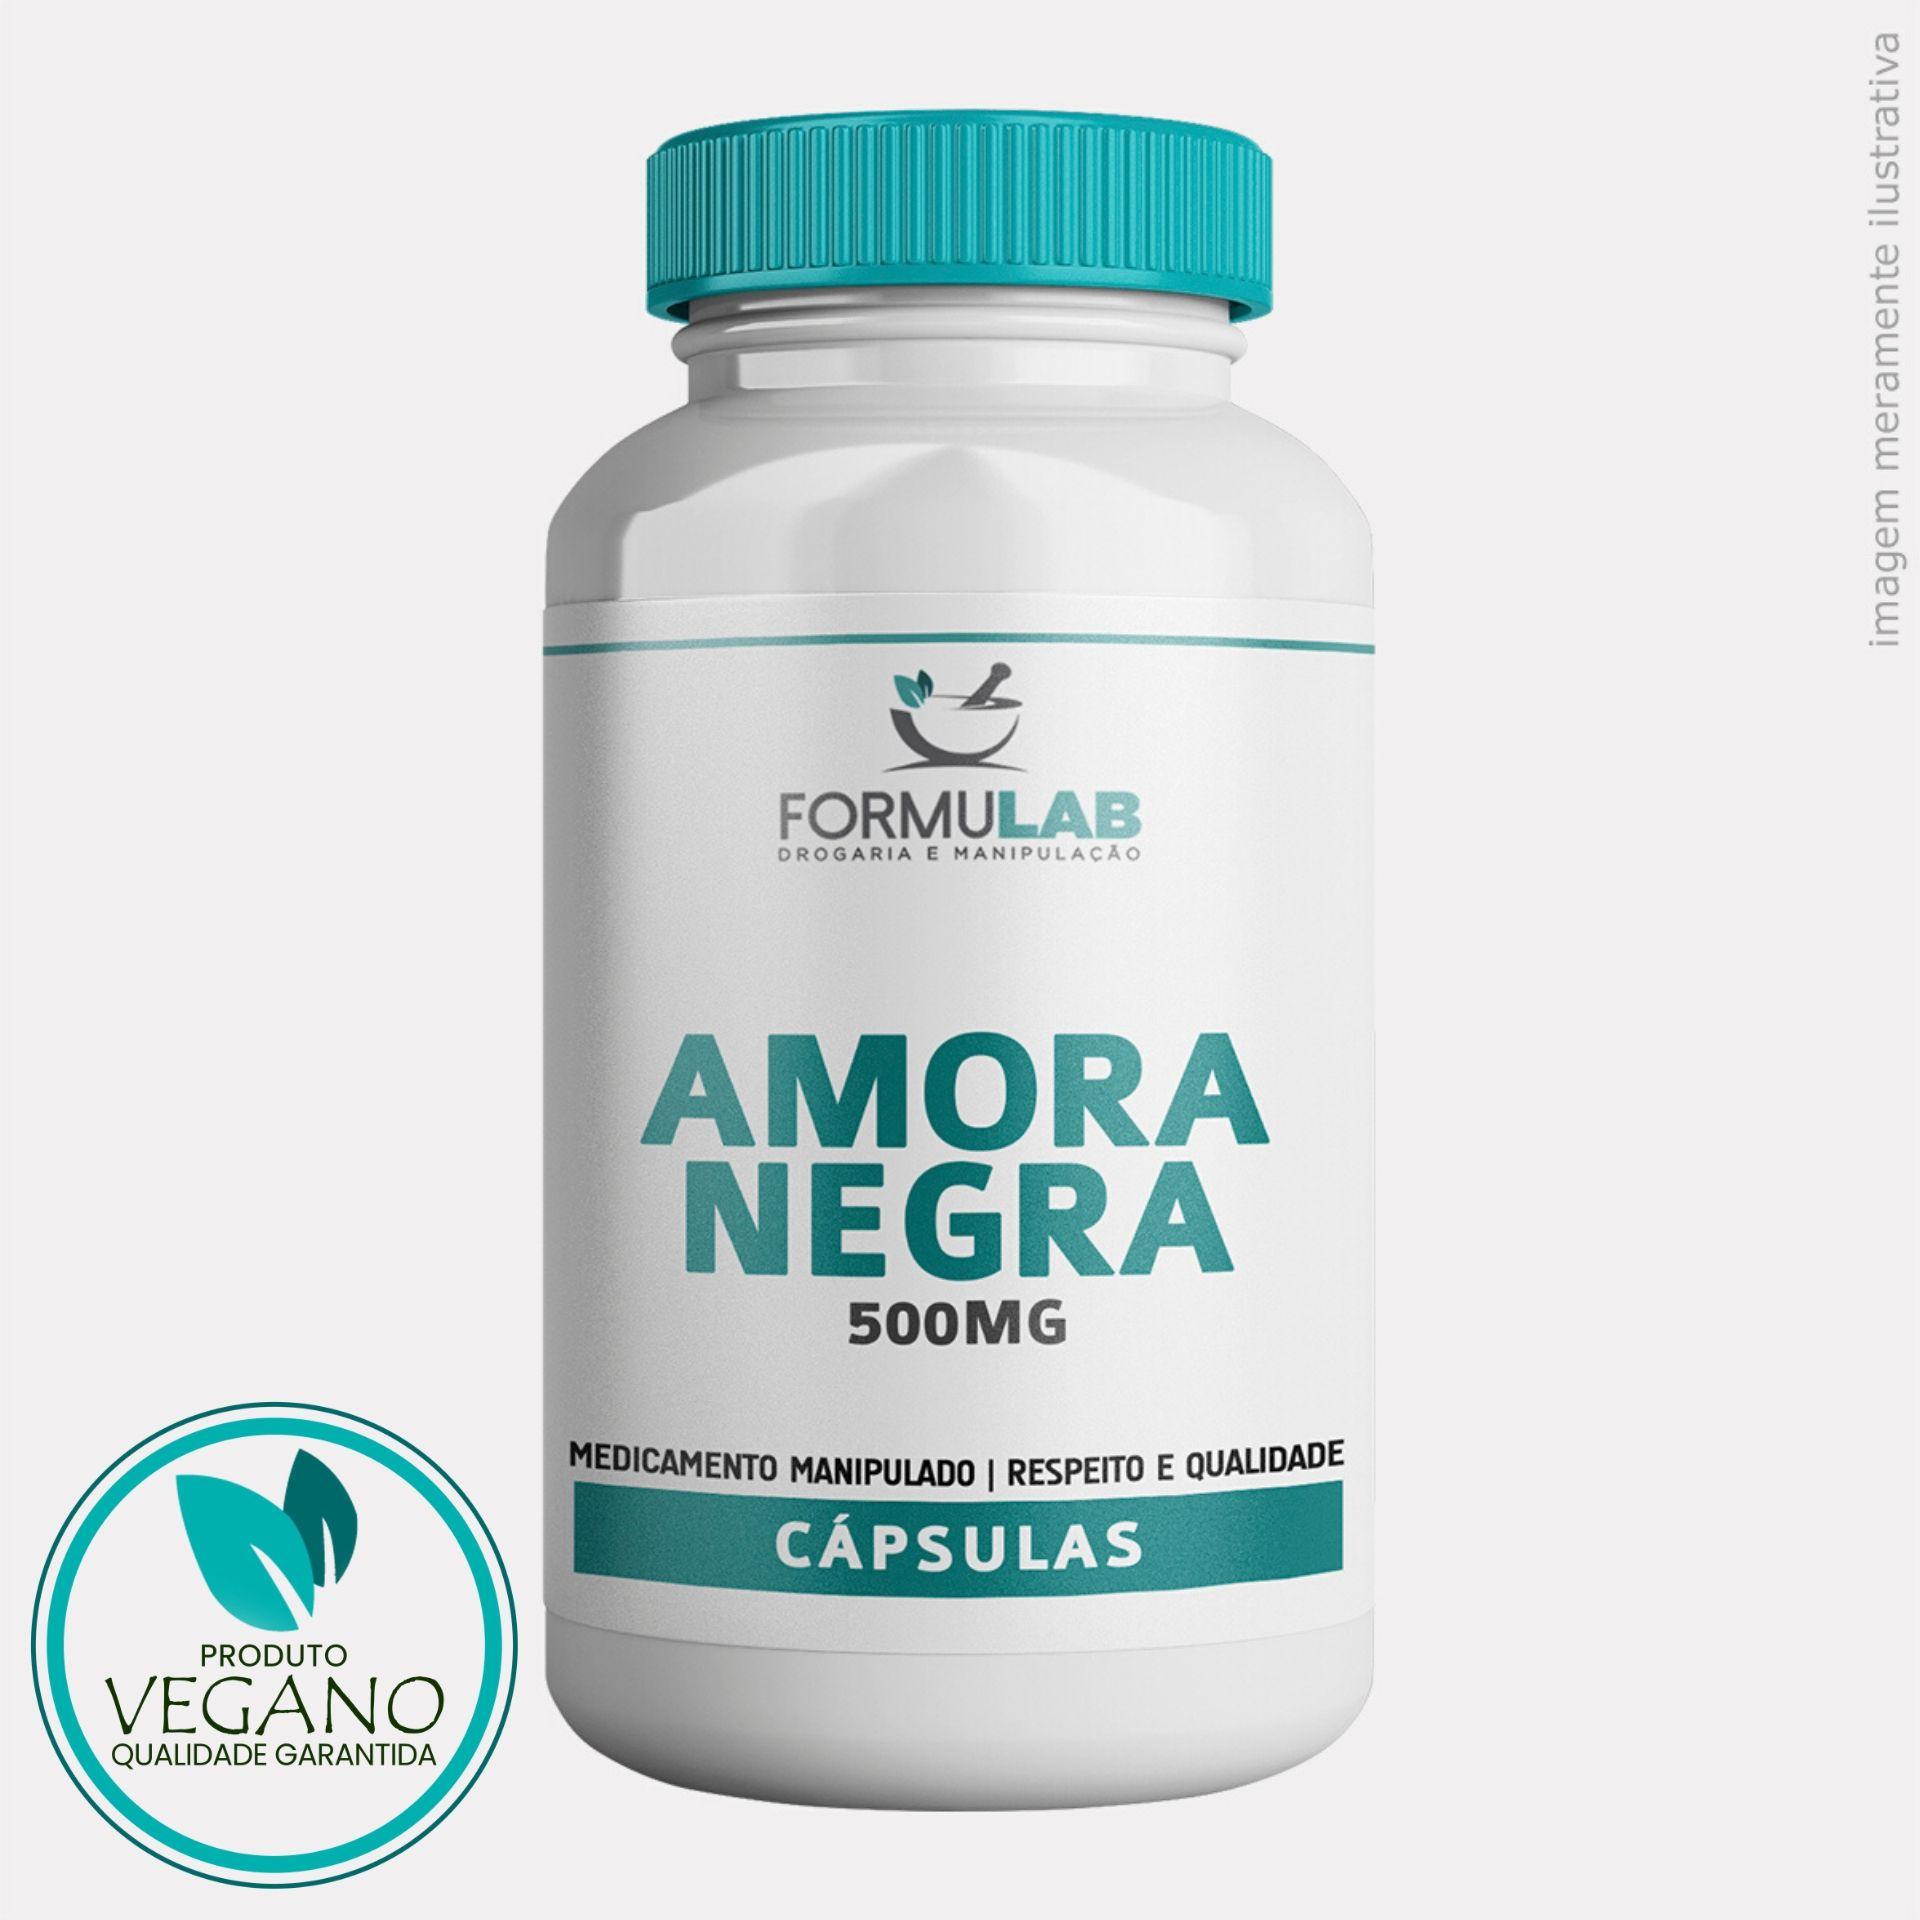 Amora Negra 500mg - VEGANA